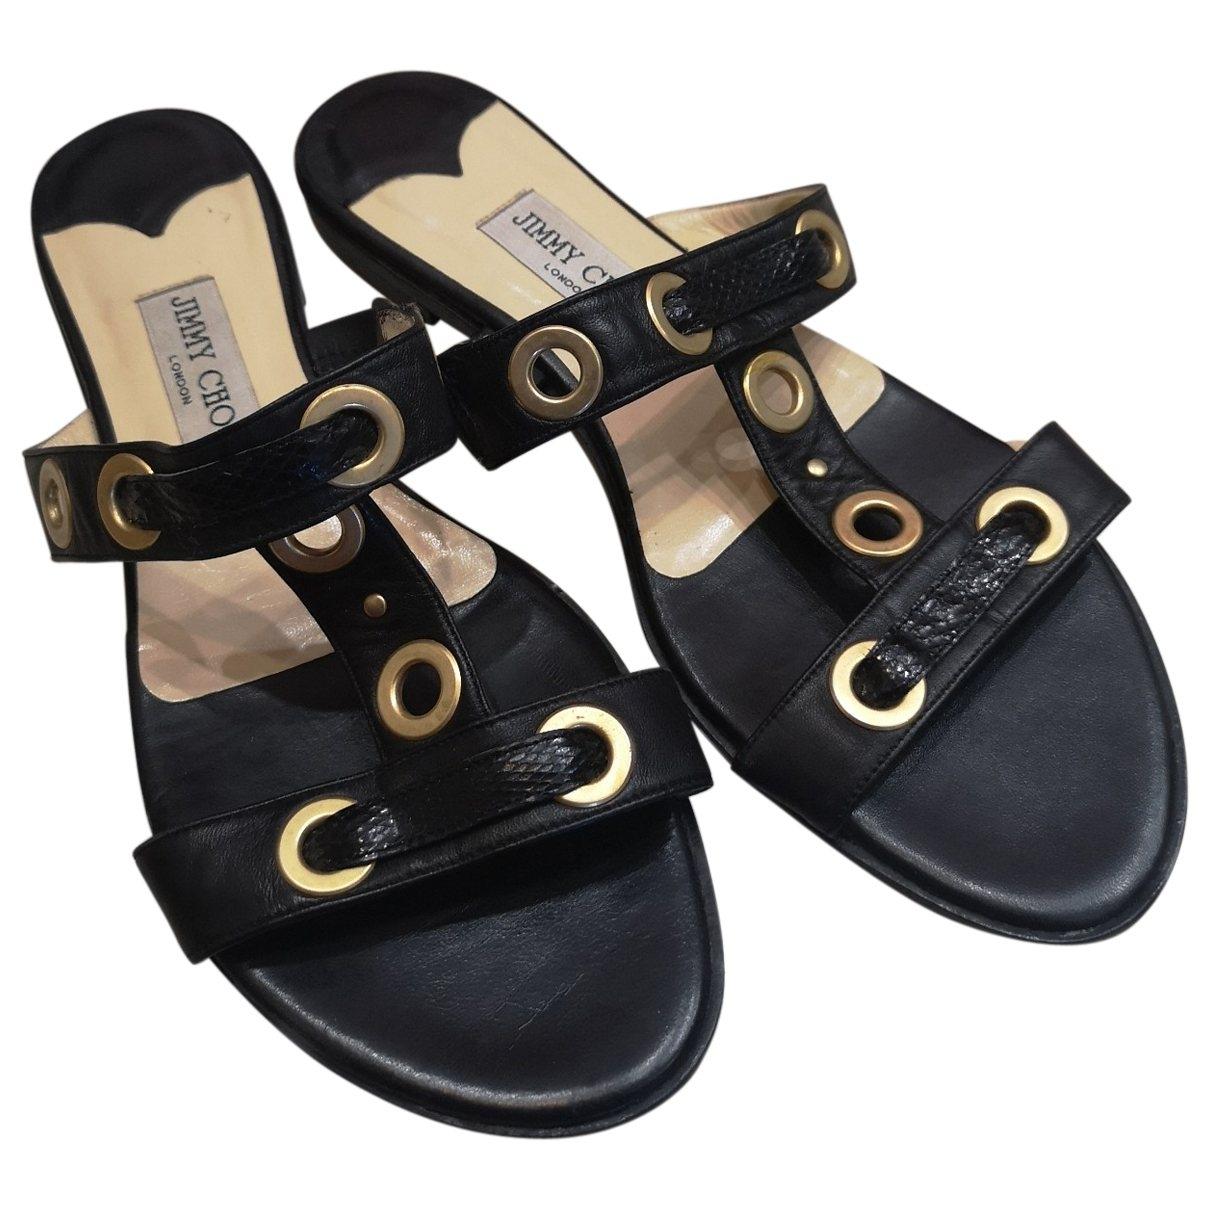 Jimmy Choo \N Black Leather Mules & Clogs for Women 40.5 EU